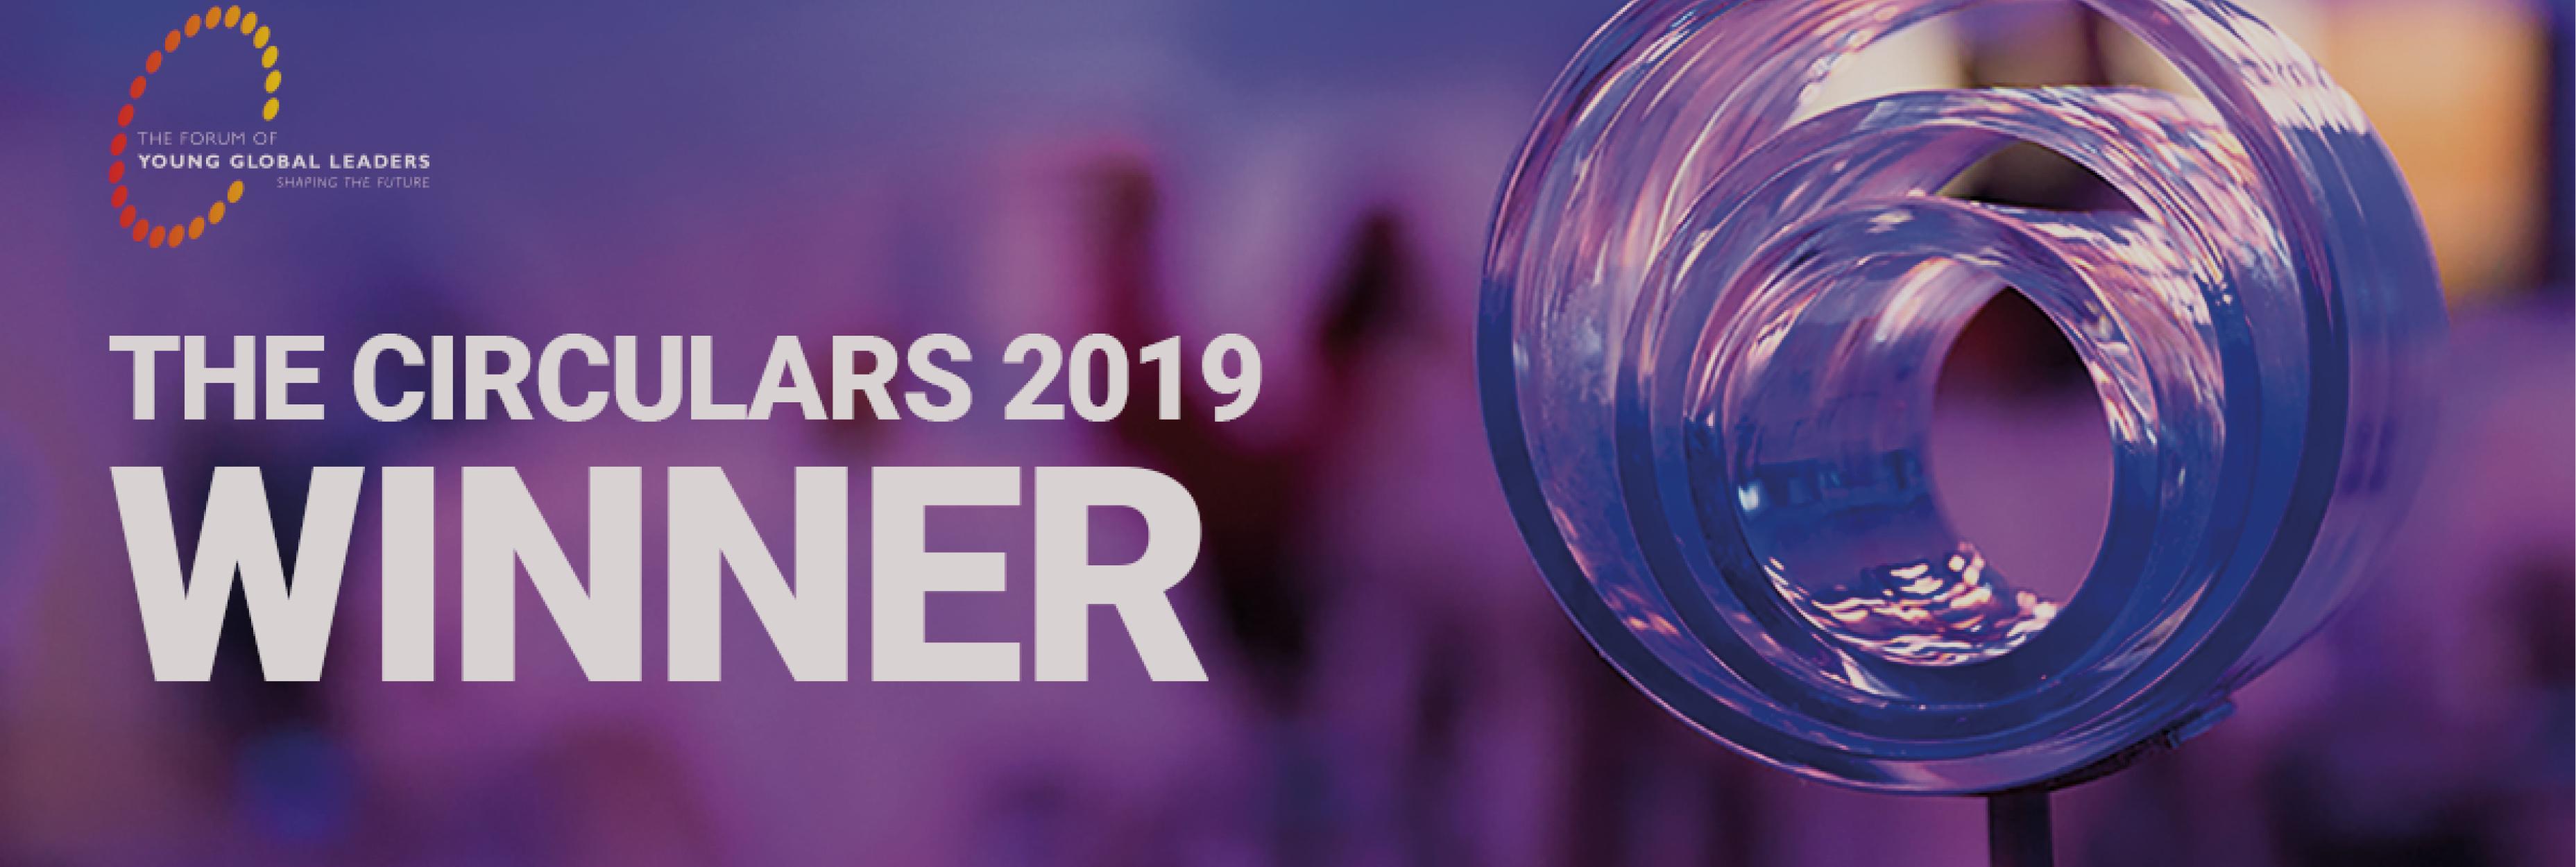 Winnow wins The Circulars award 2019